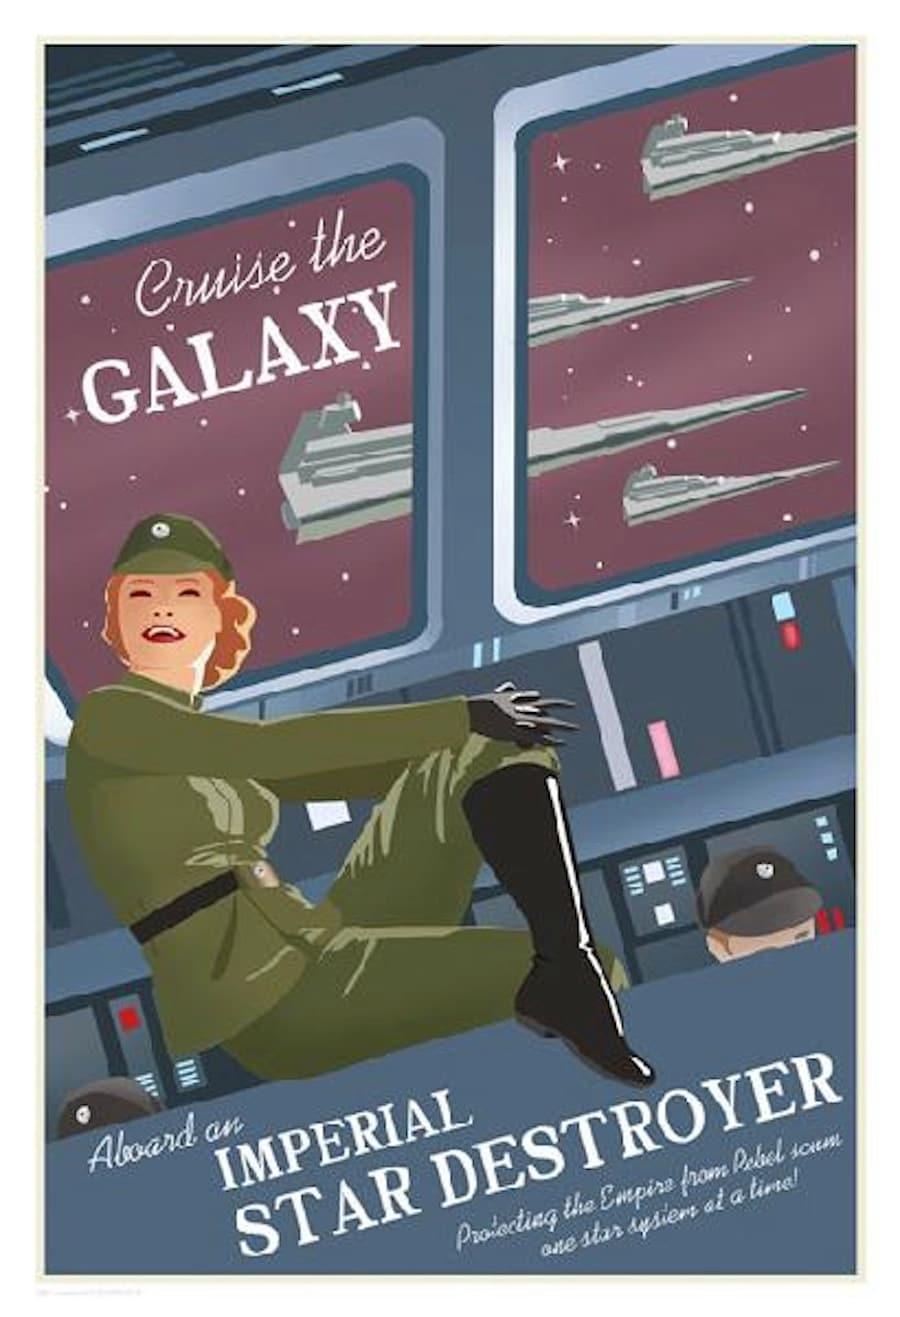 Cruise the Galaxy